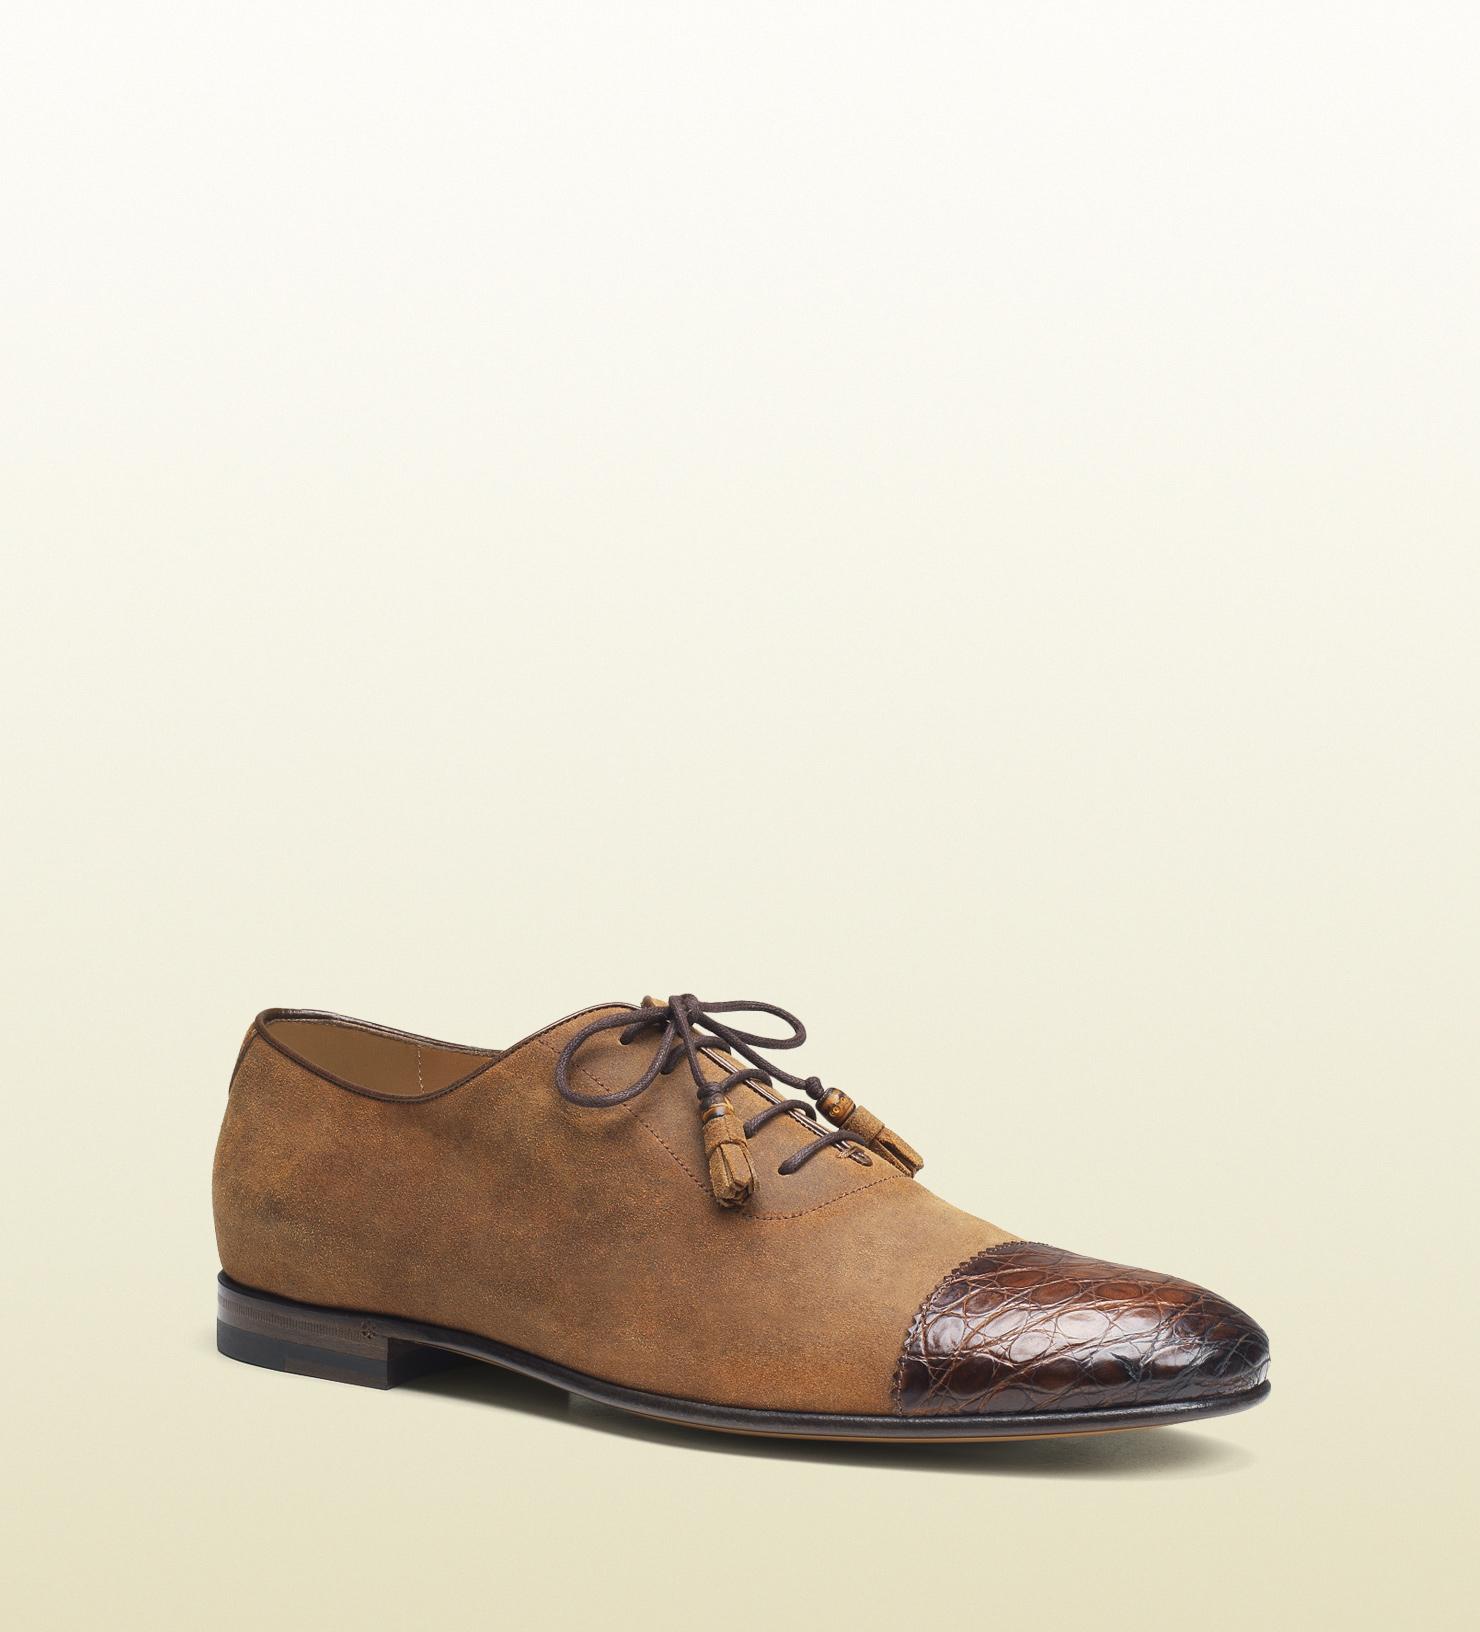 Bonobos Men S Shoes